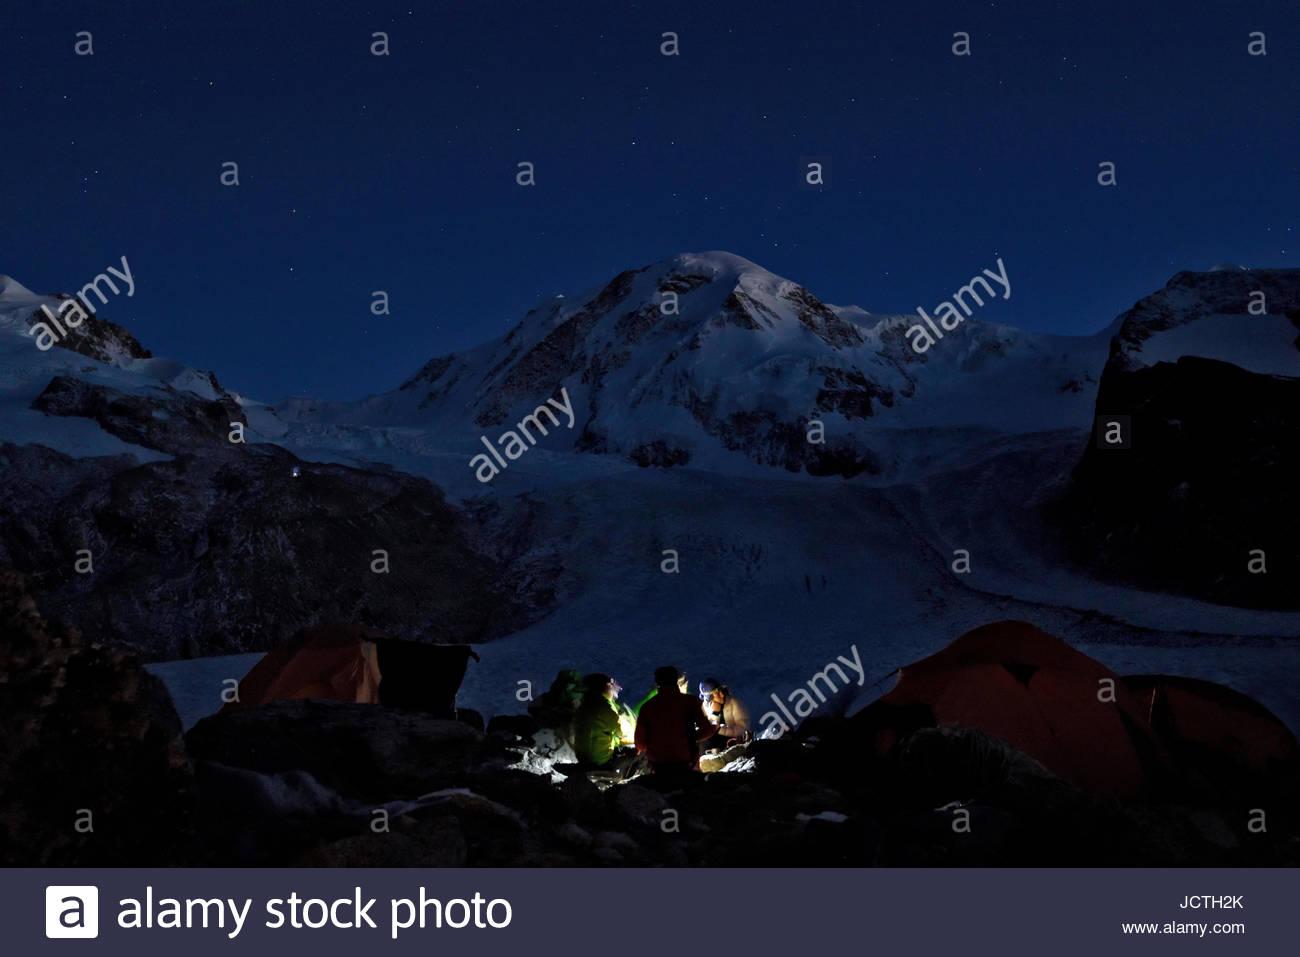 Four Italian cave explorers enjoy their last night on the glacier beneath the stars eating their meal. The faint - Stock Image